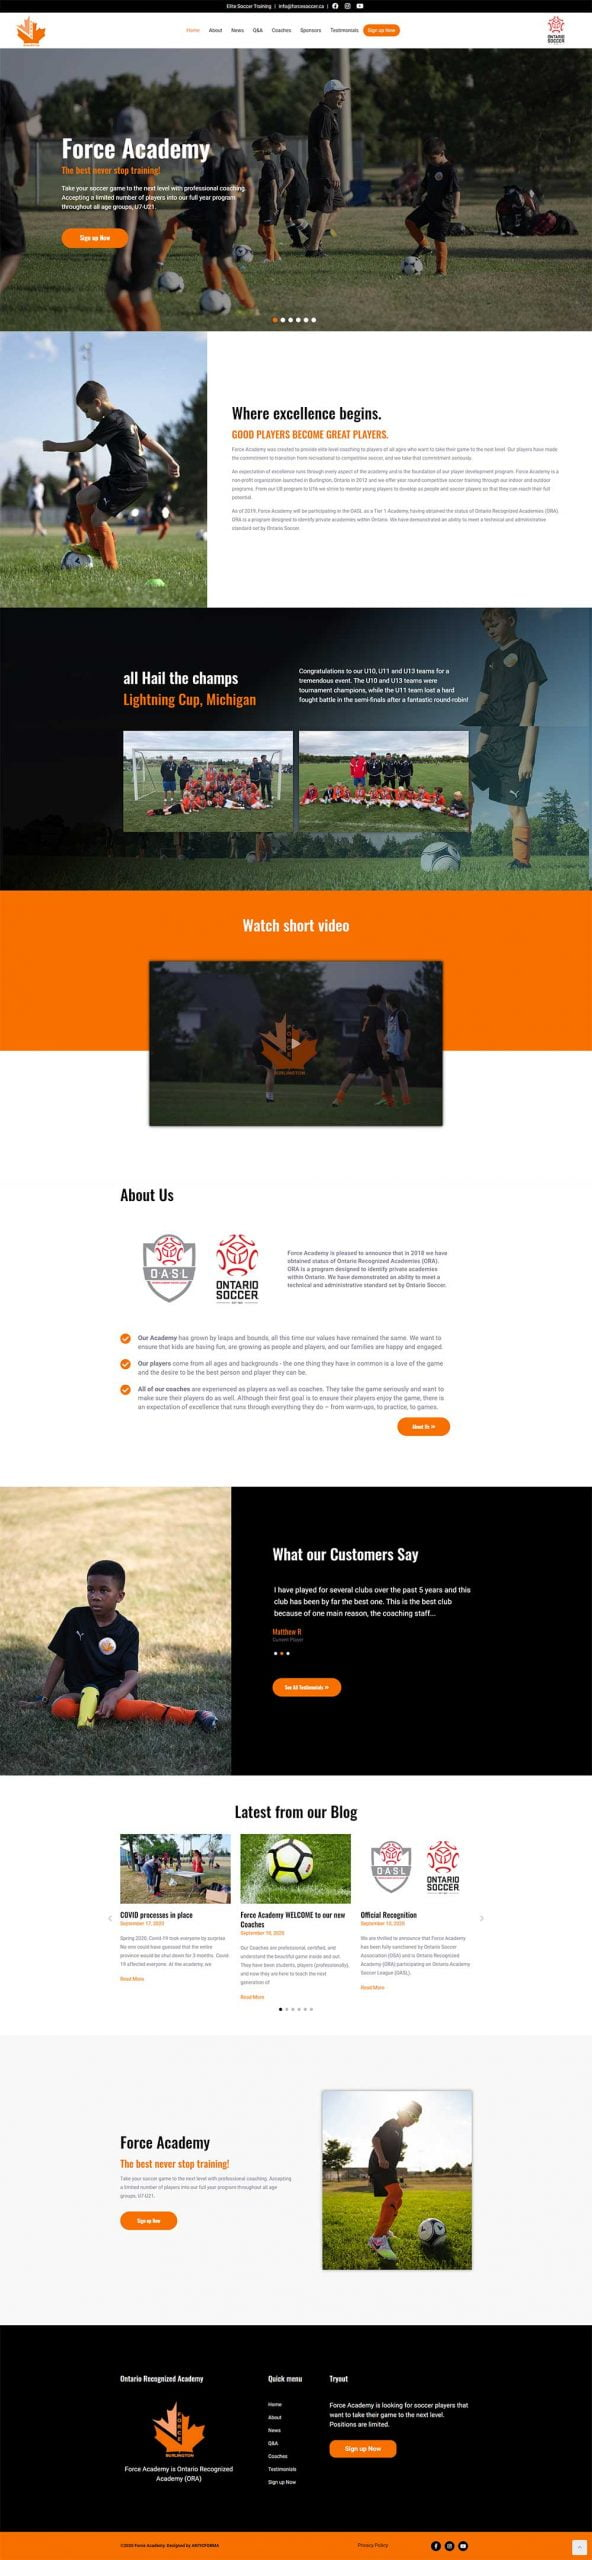 Force Soccer Academy